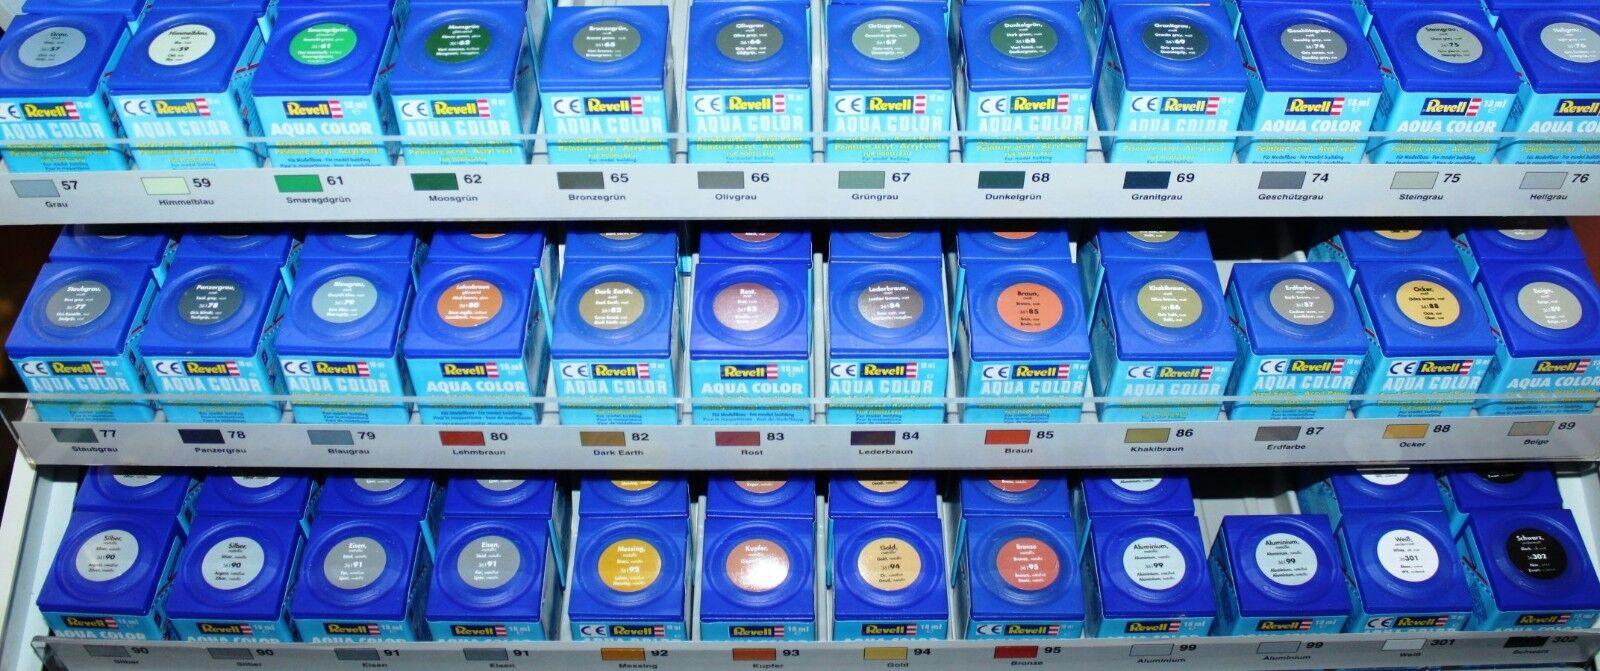 Revell Aqua Color Serie 36 88 verschiedene Farbtöne 18ml(100ml=21,39€)